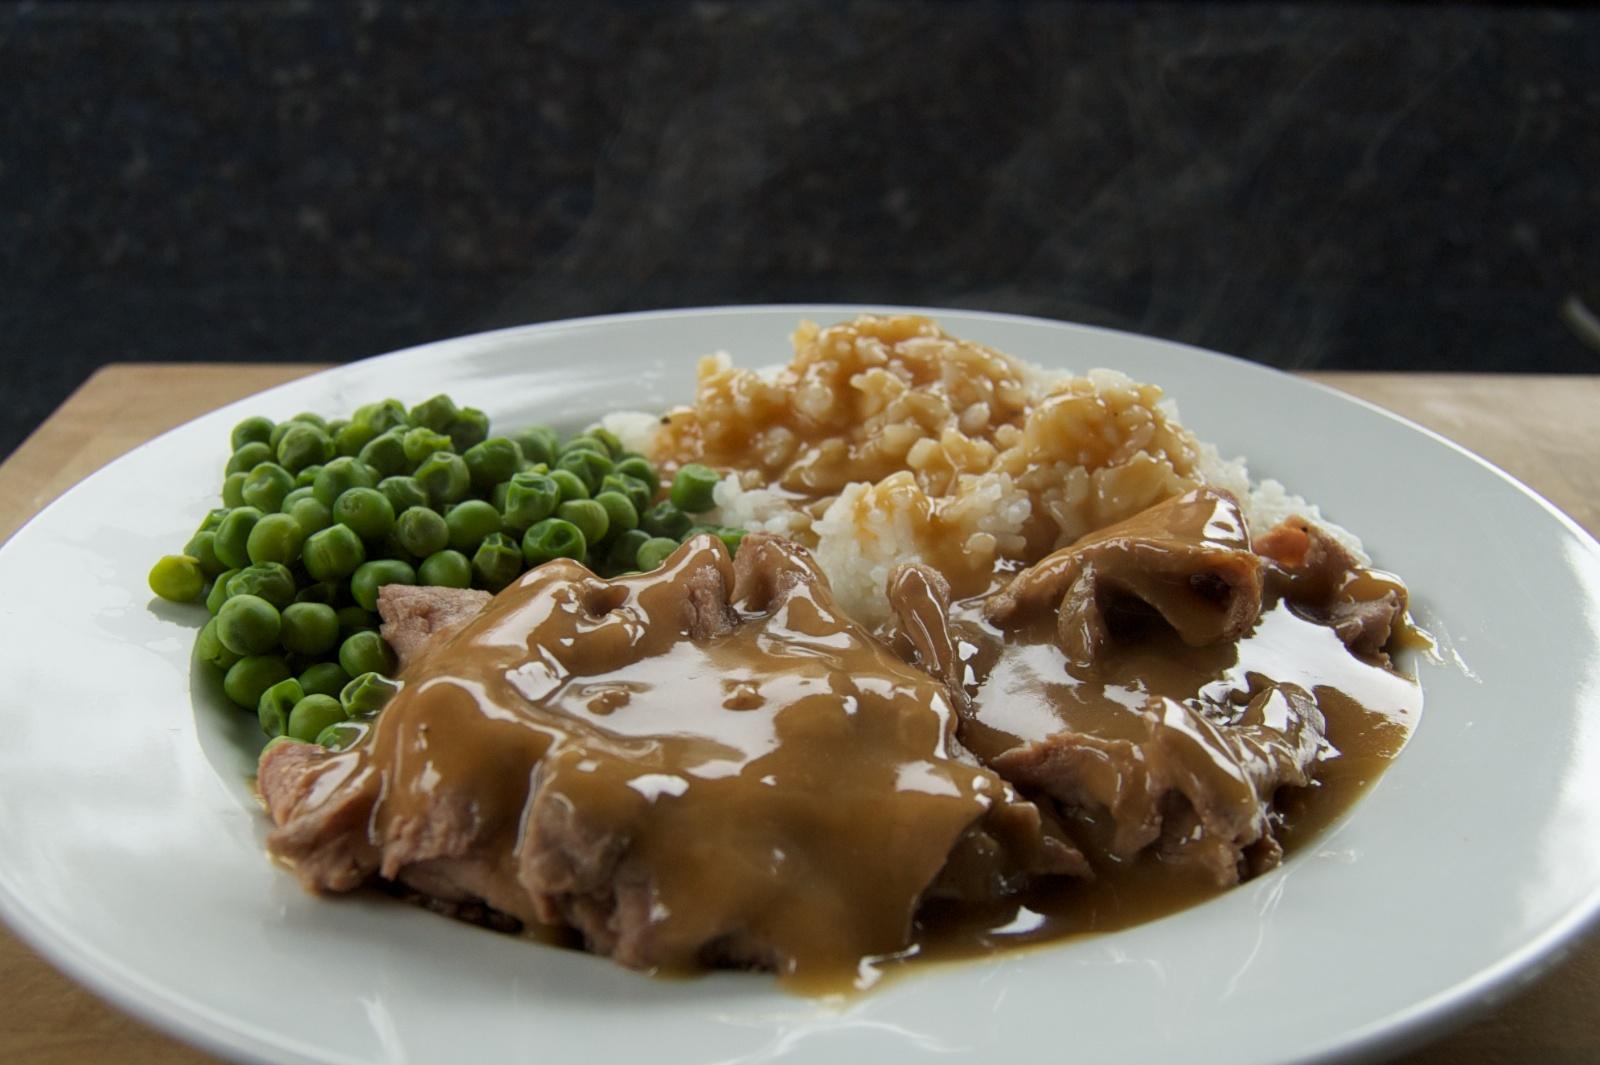 http://blog.rickk.com/food/2012/10/13/ate.2012.10.13.d.jpg